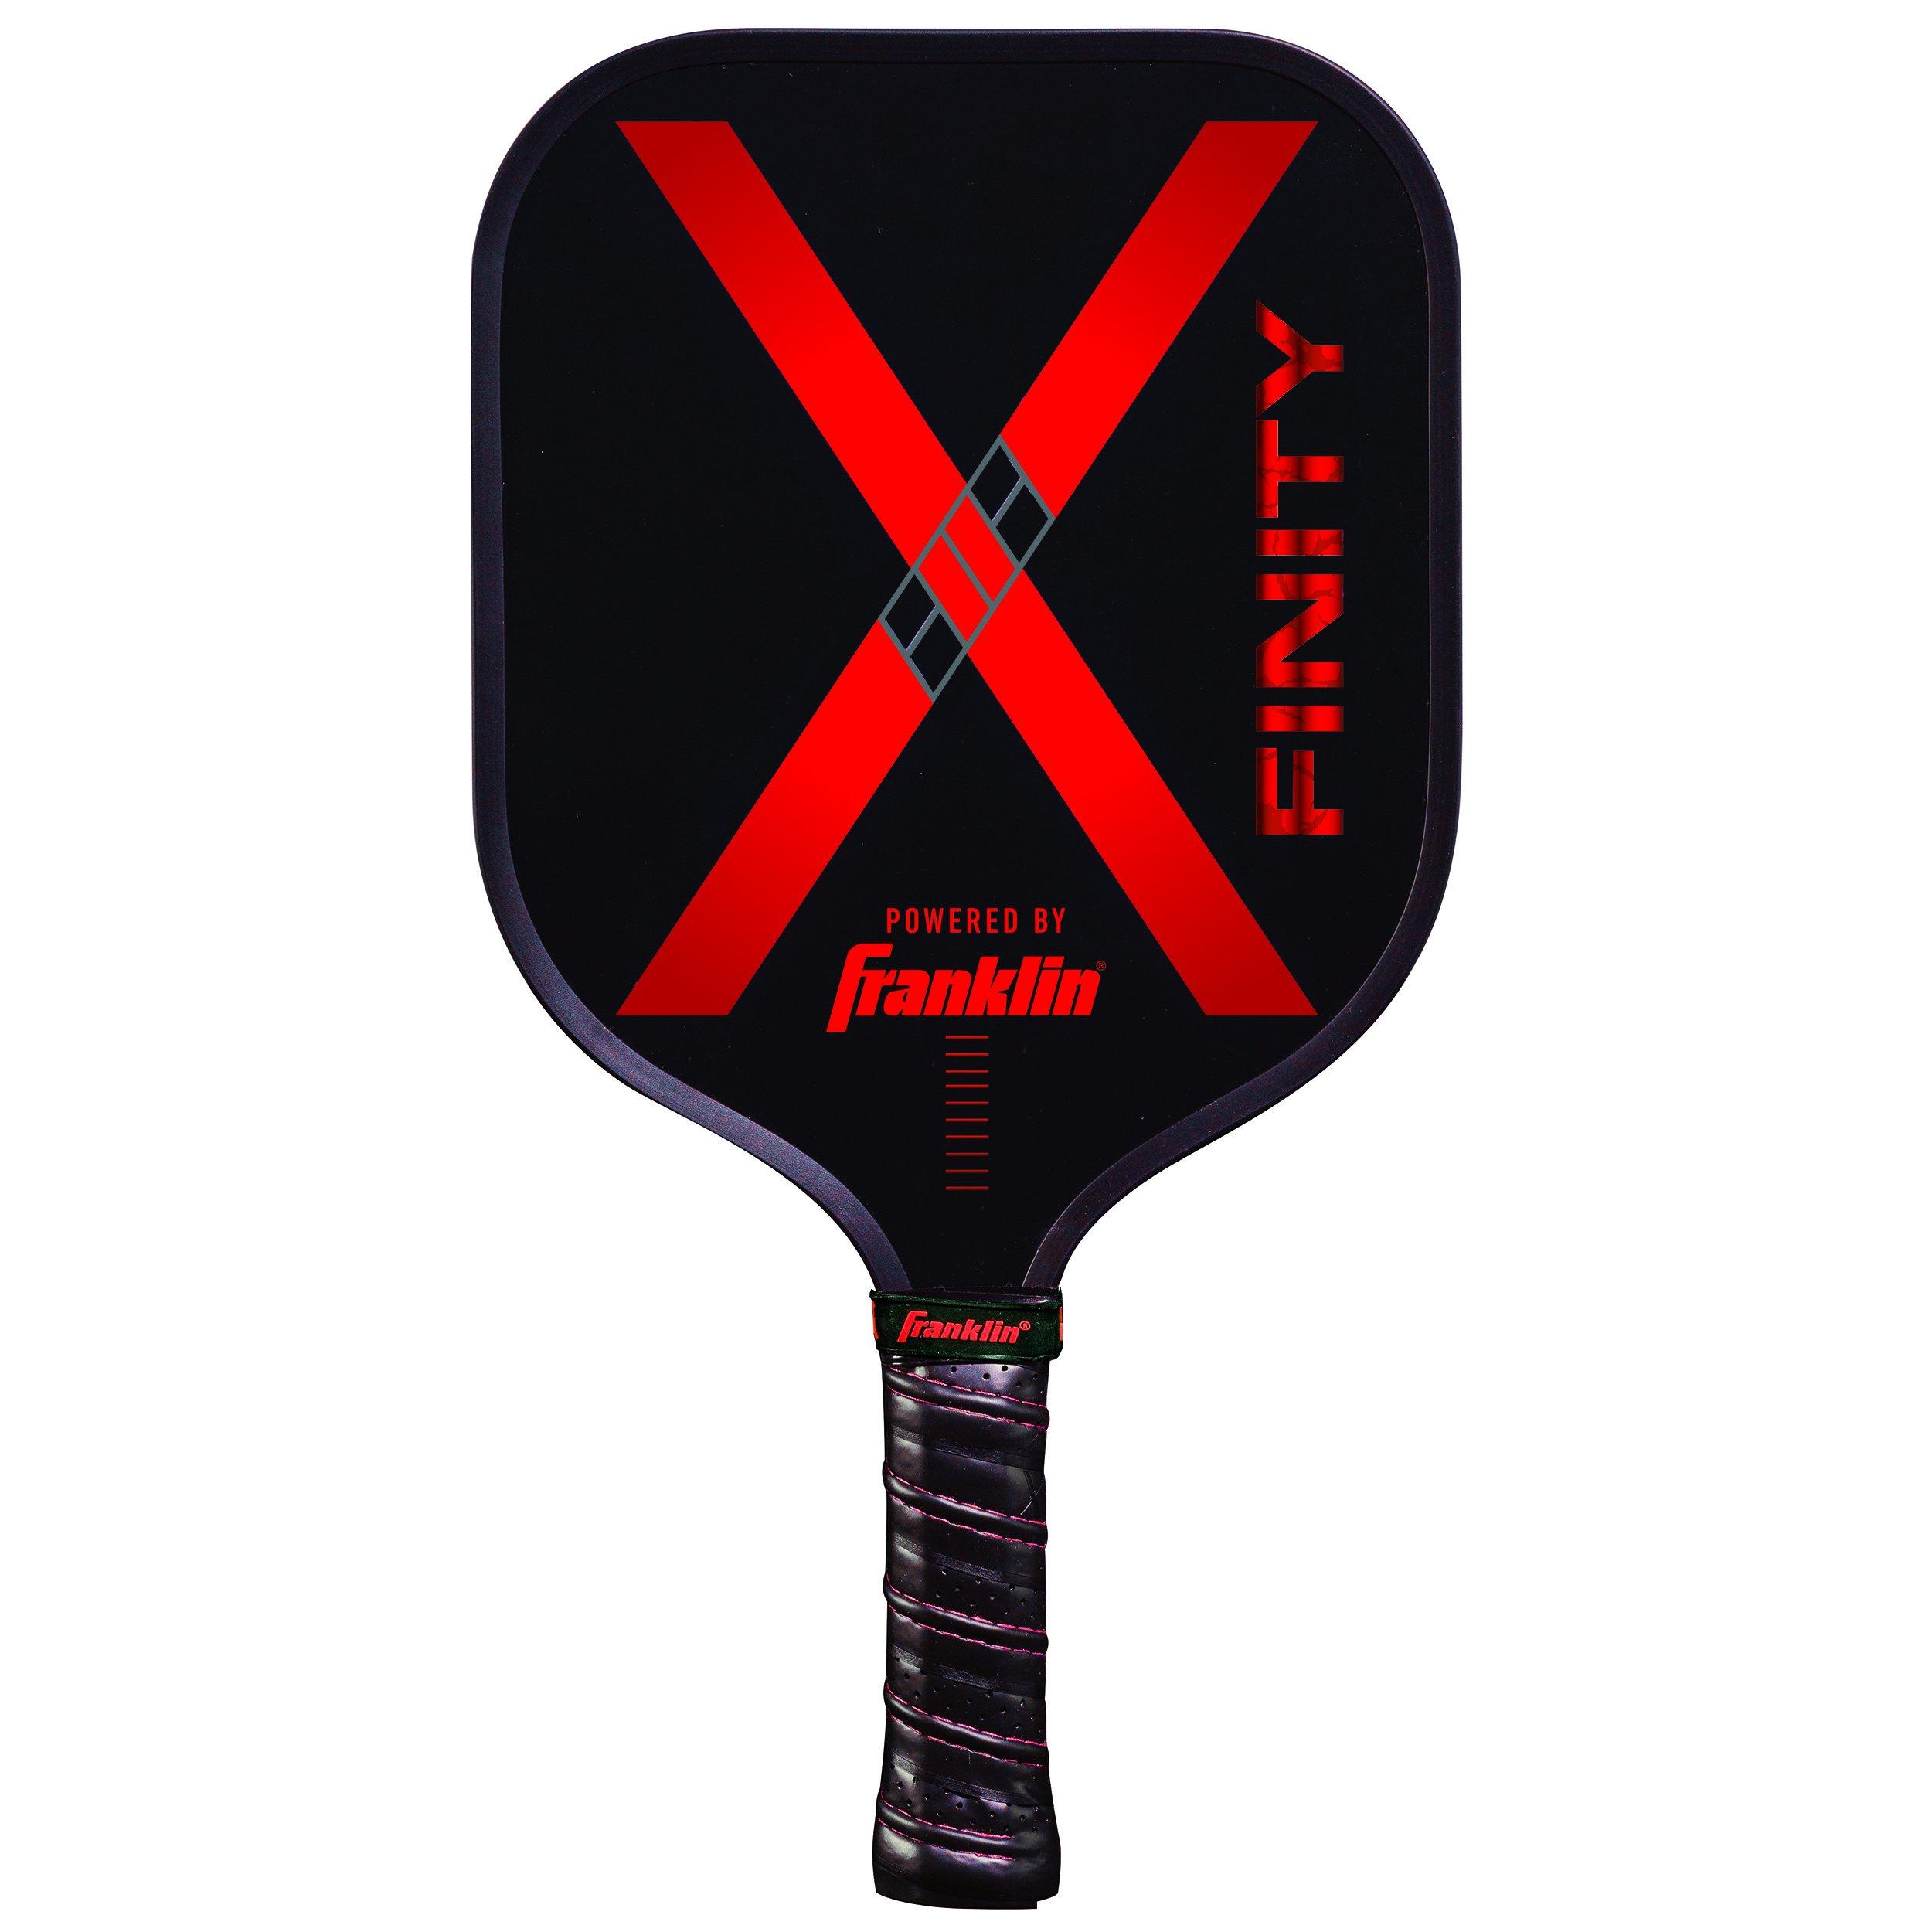 Franklin Sports Pickleball Paddle - Nomex Pickleball Racket